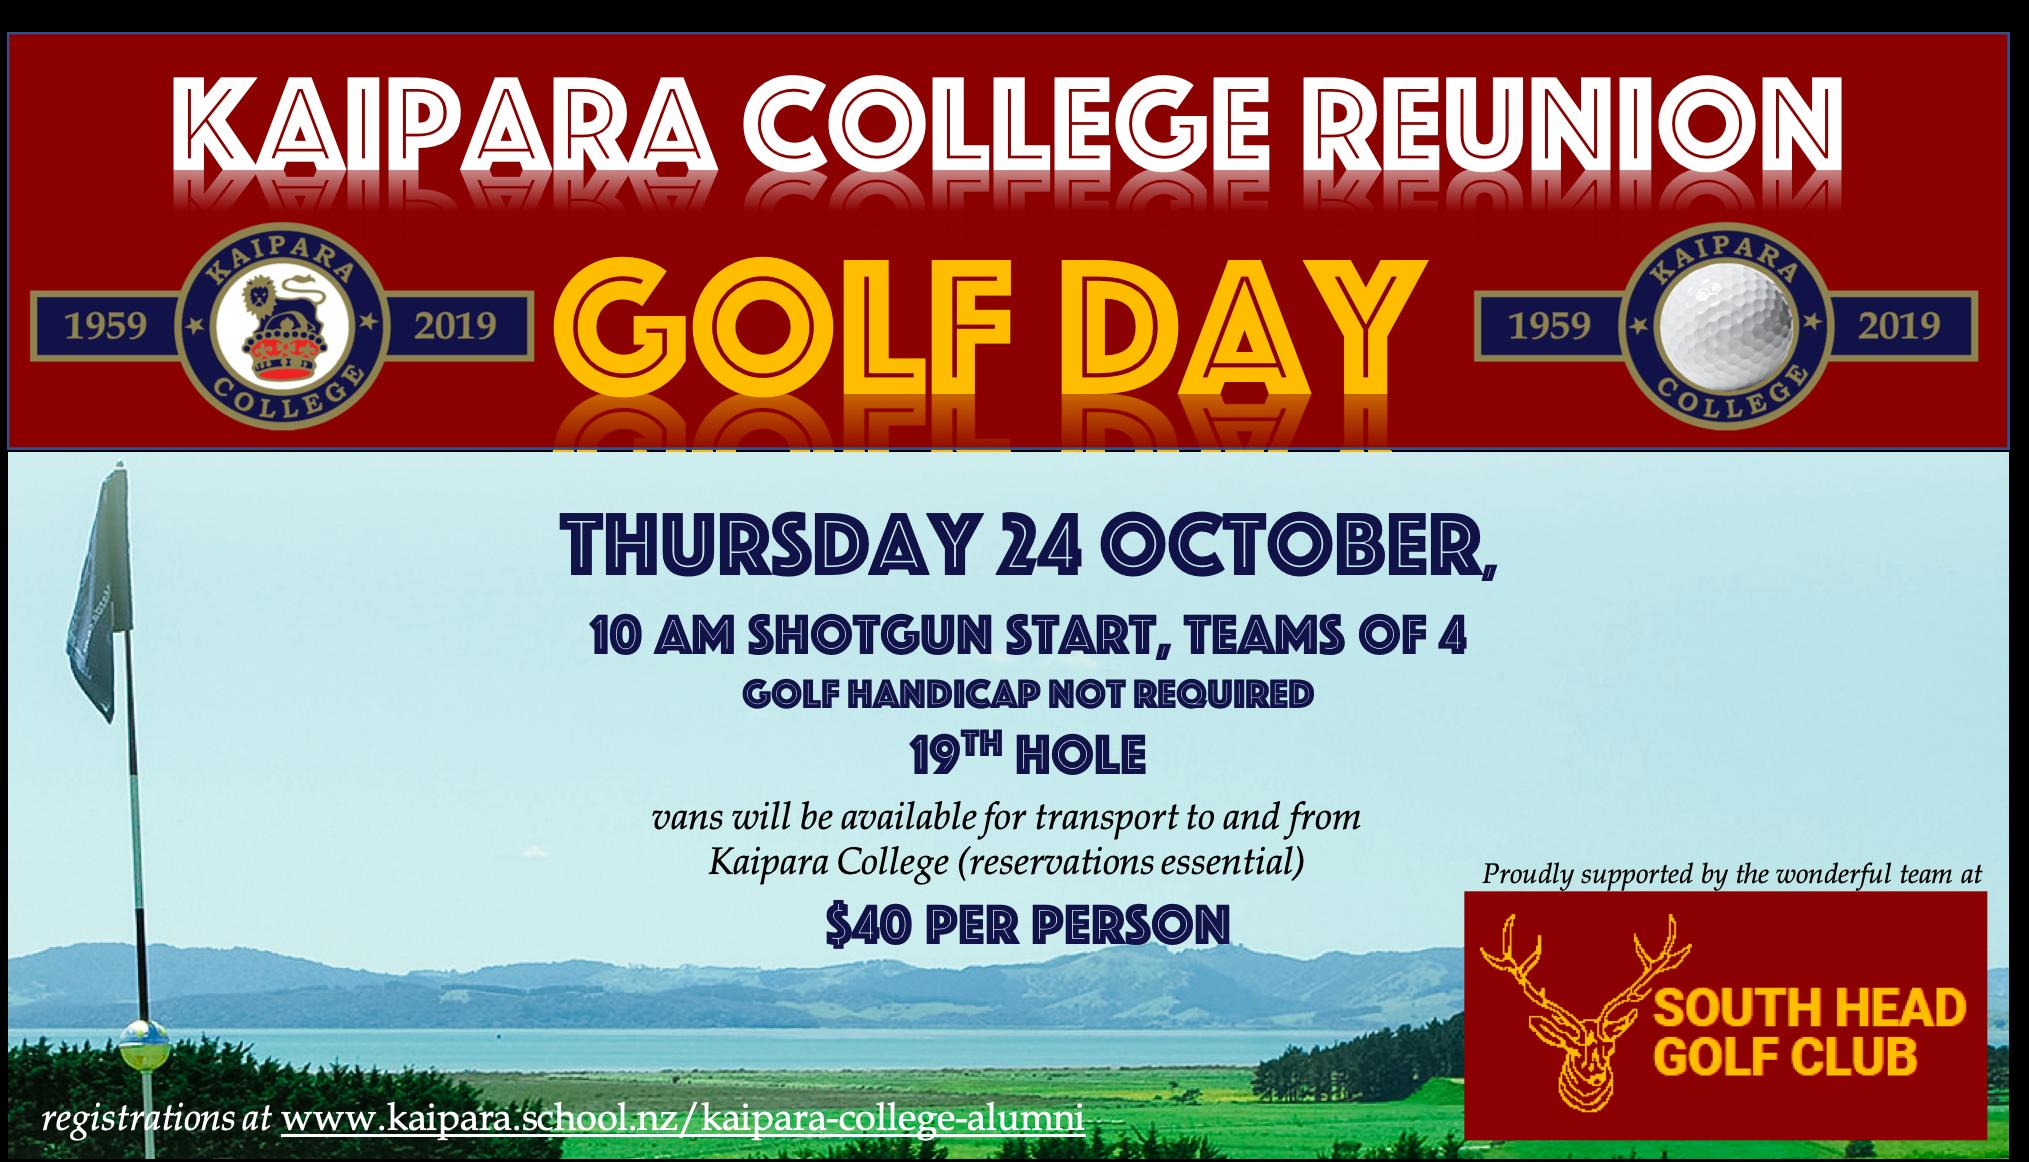 Reunion Golf Day